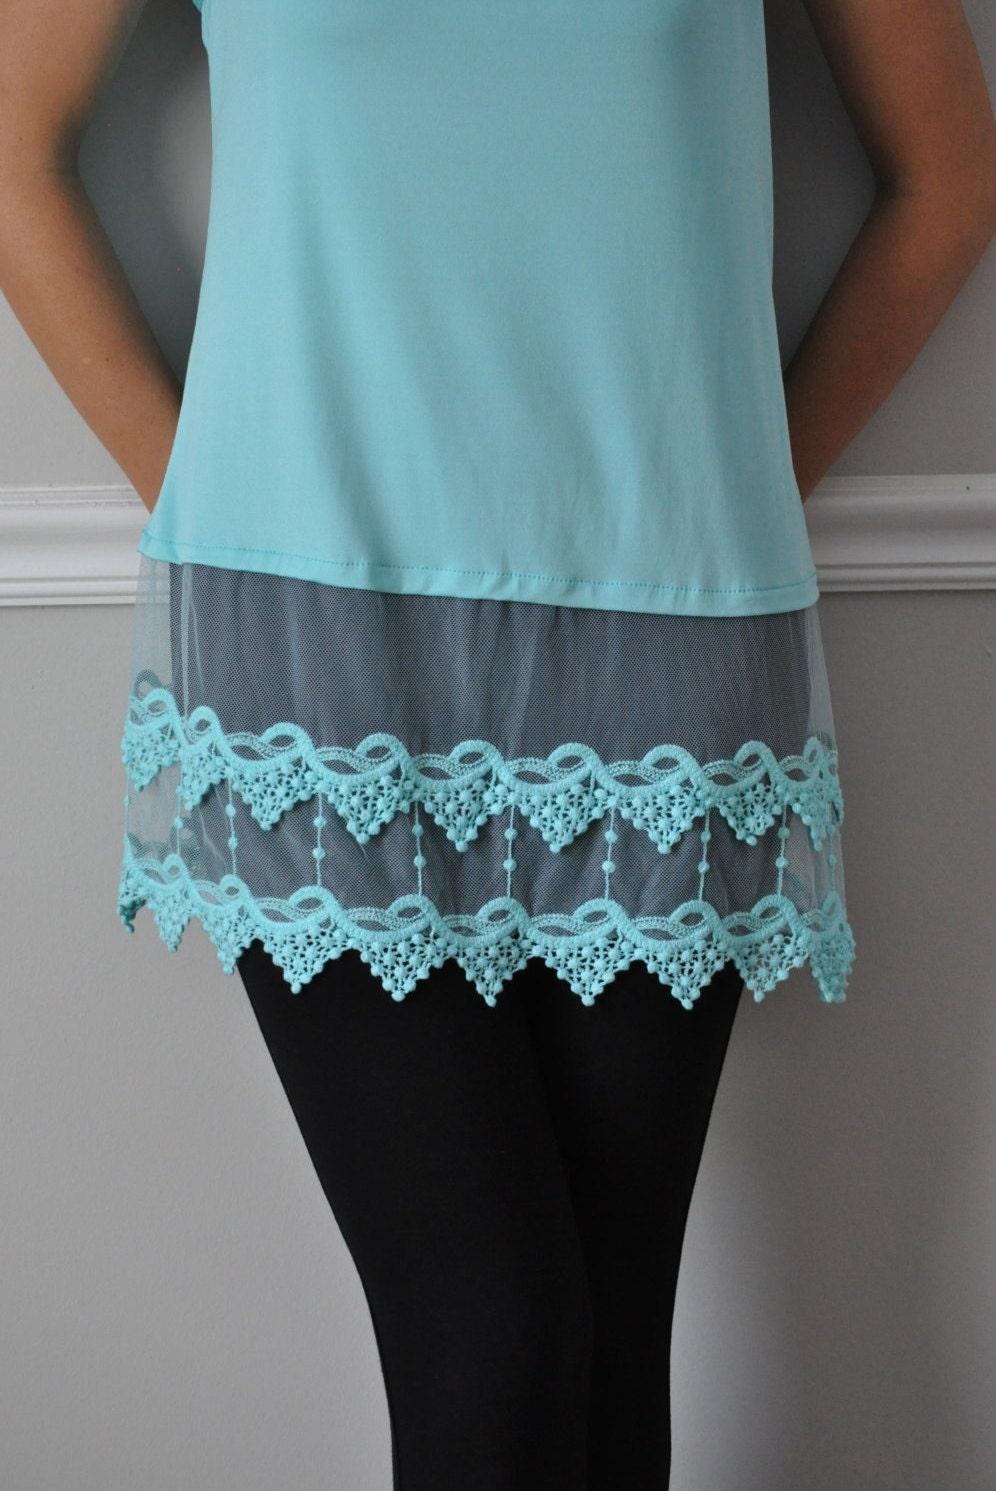 Slip extender top slip extender shirt extenders lace by vezanie